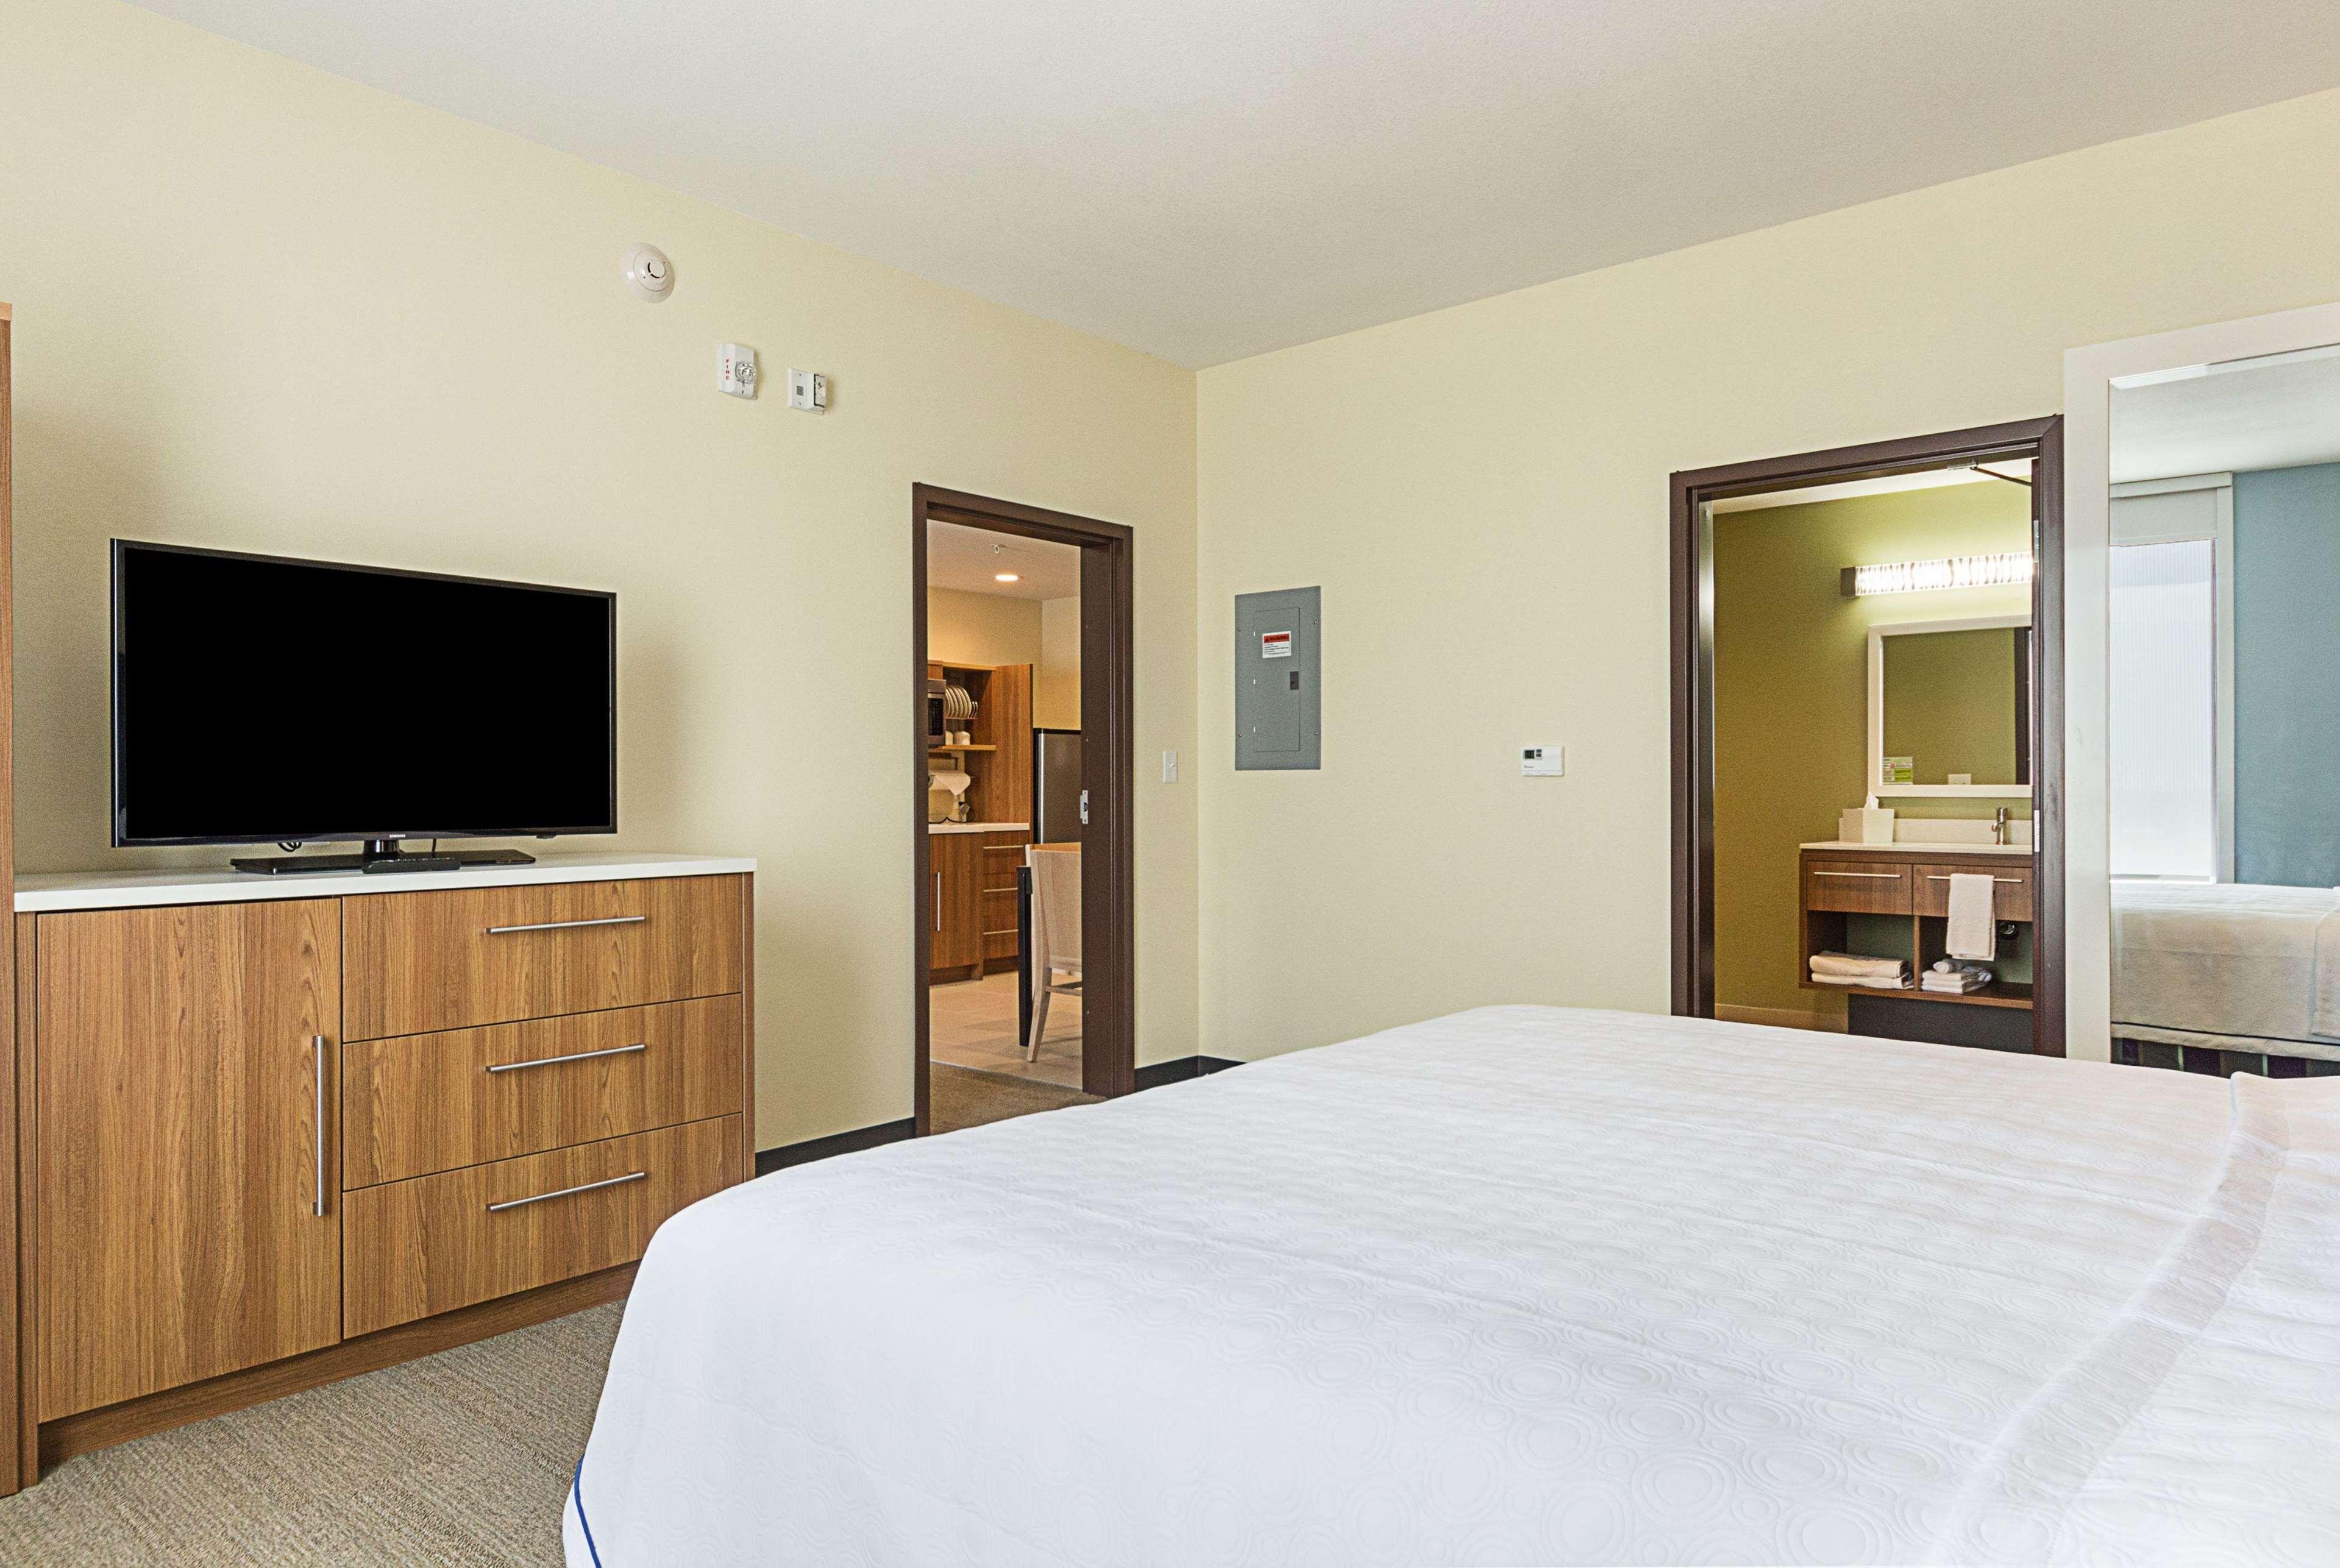 Home 2 Suites by Hilton - Yukon image 34